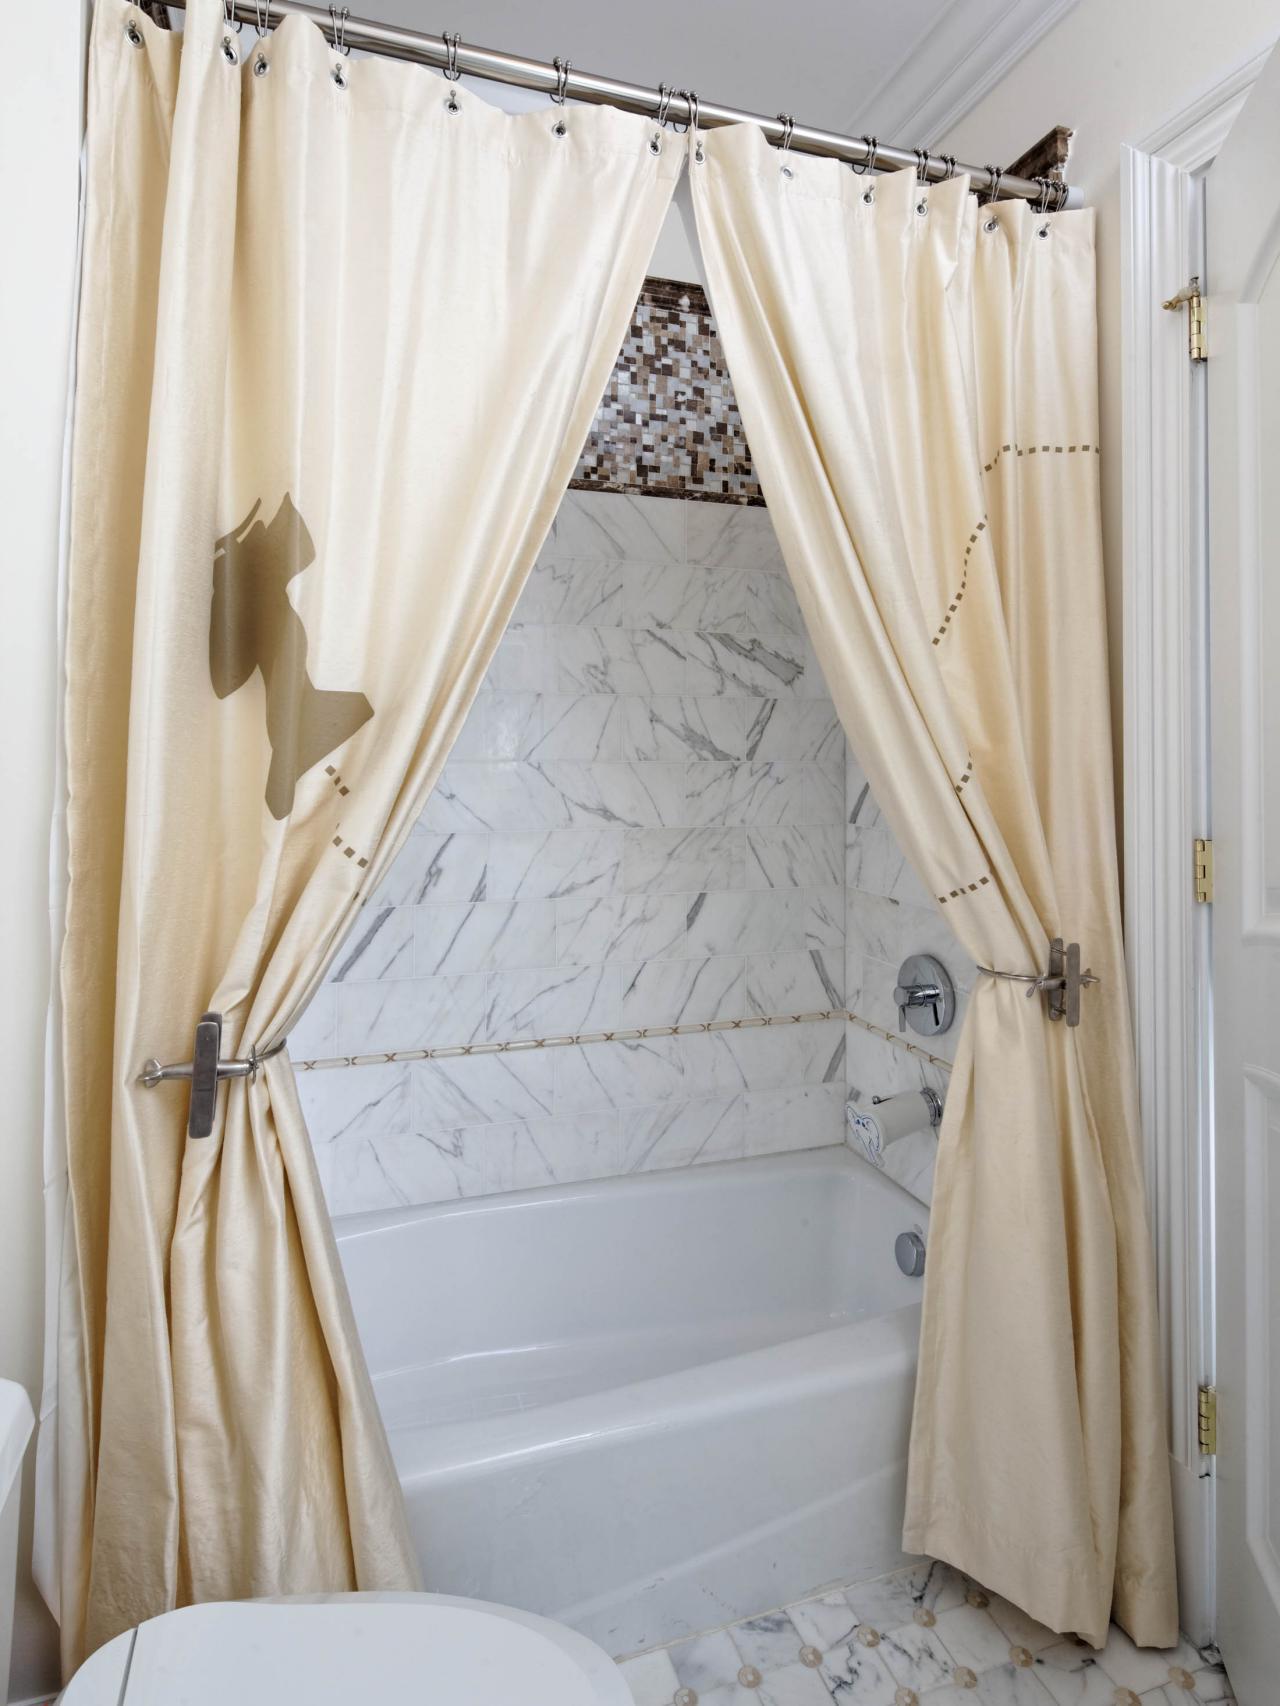 RS_dahlia-mahmood-blue-eclectic-kid-room-bathroom-tub_3x4.jpg.rend.hgtvcom.1280.1707